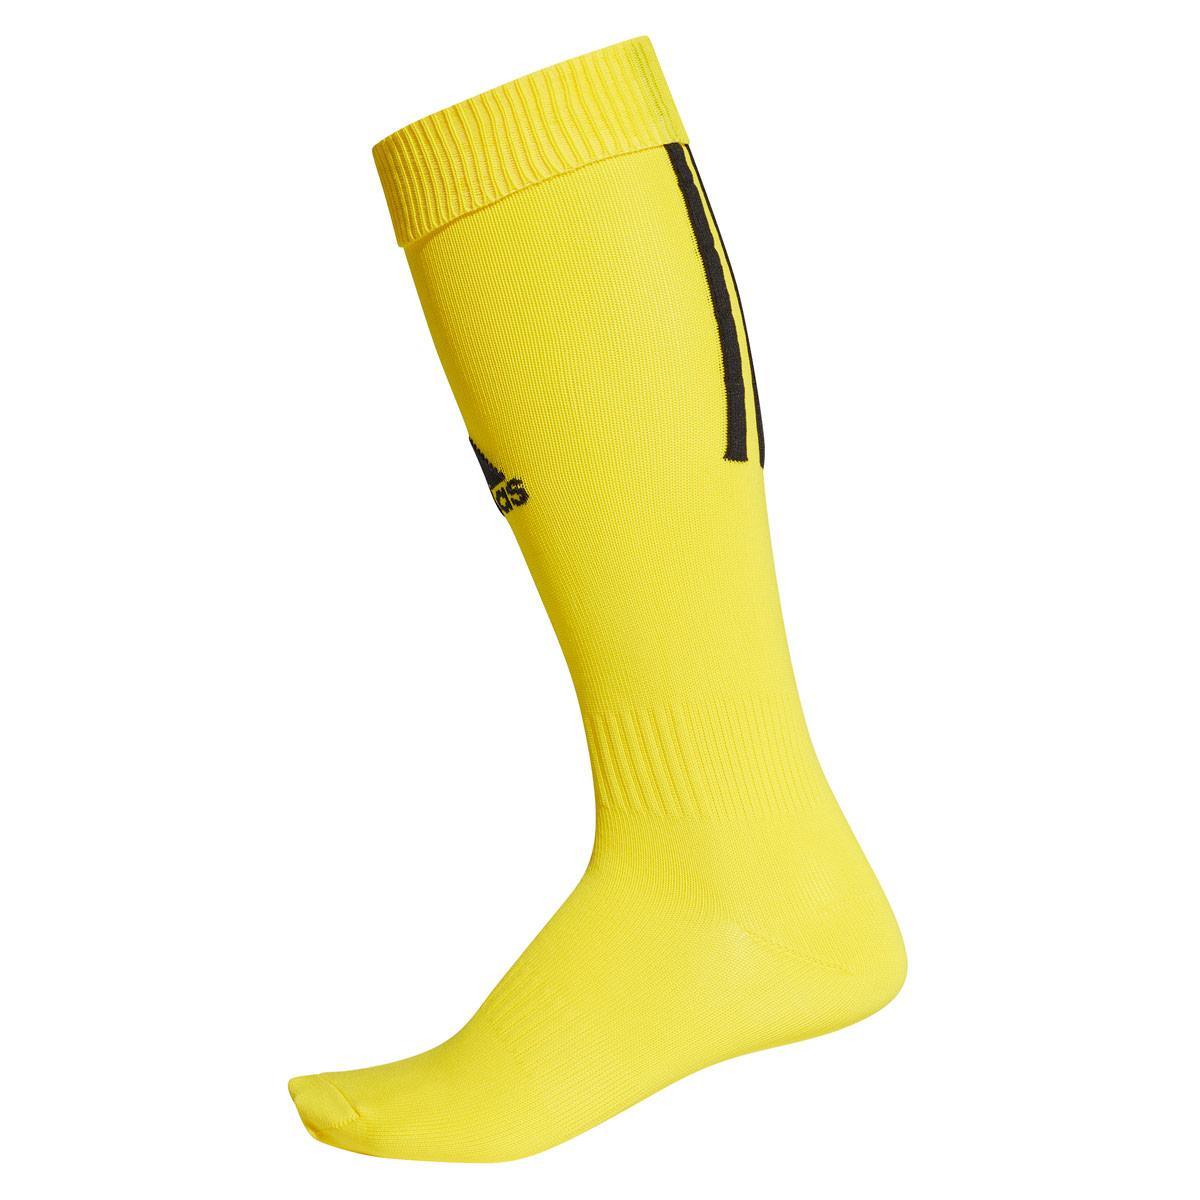 10ca6cdc2 adidas Santos Sock 18 - Running socks - Yellow | 21RUN